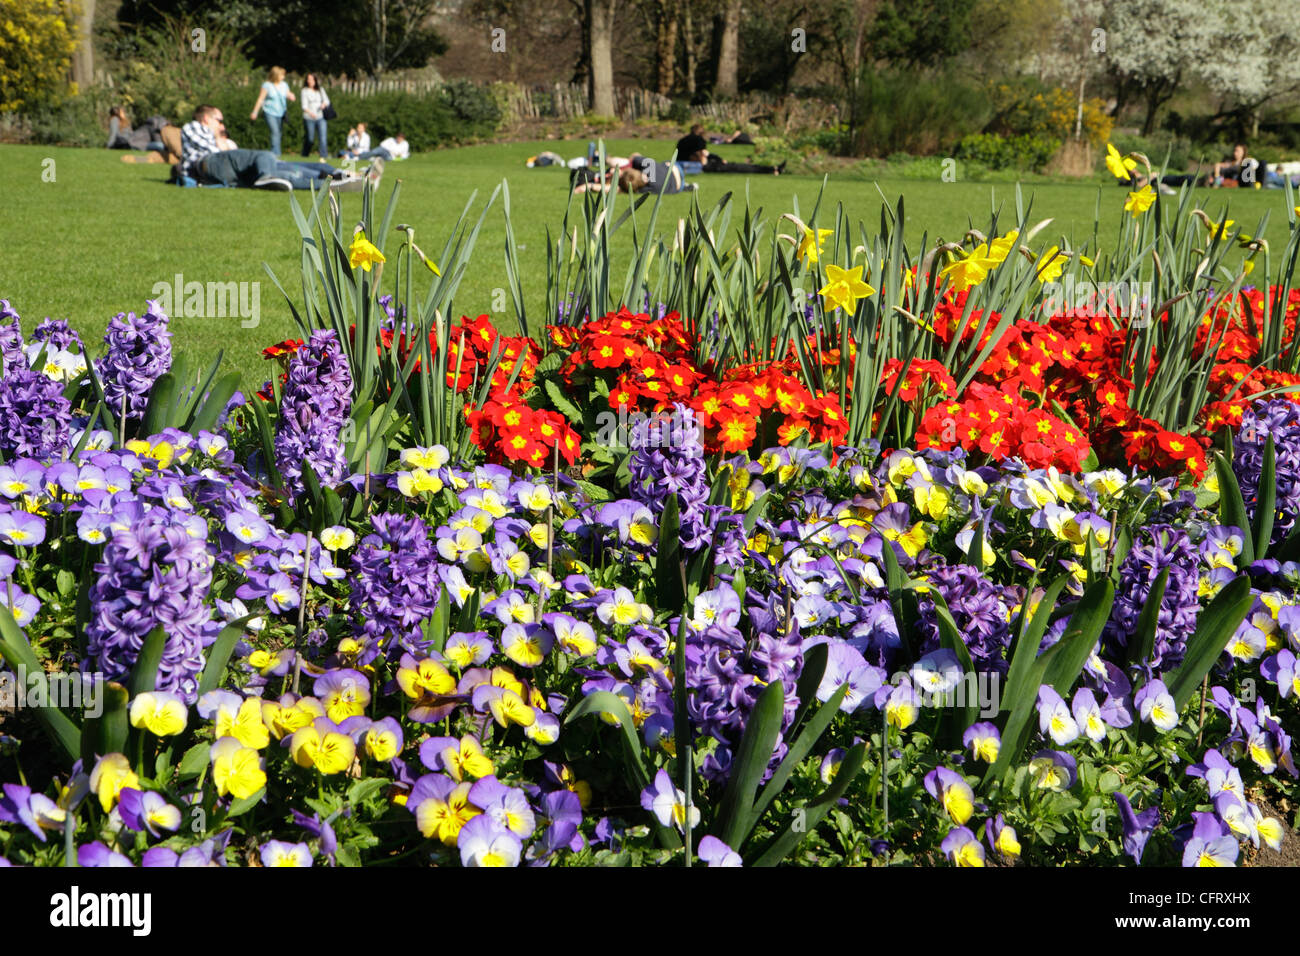 Spring flowers hyde park london uk stock photo 44166358 alamy spring flowers hyde park london uk mightylinksfo